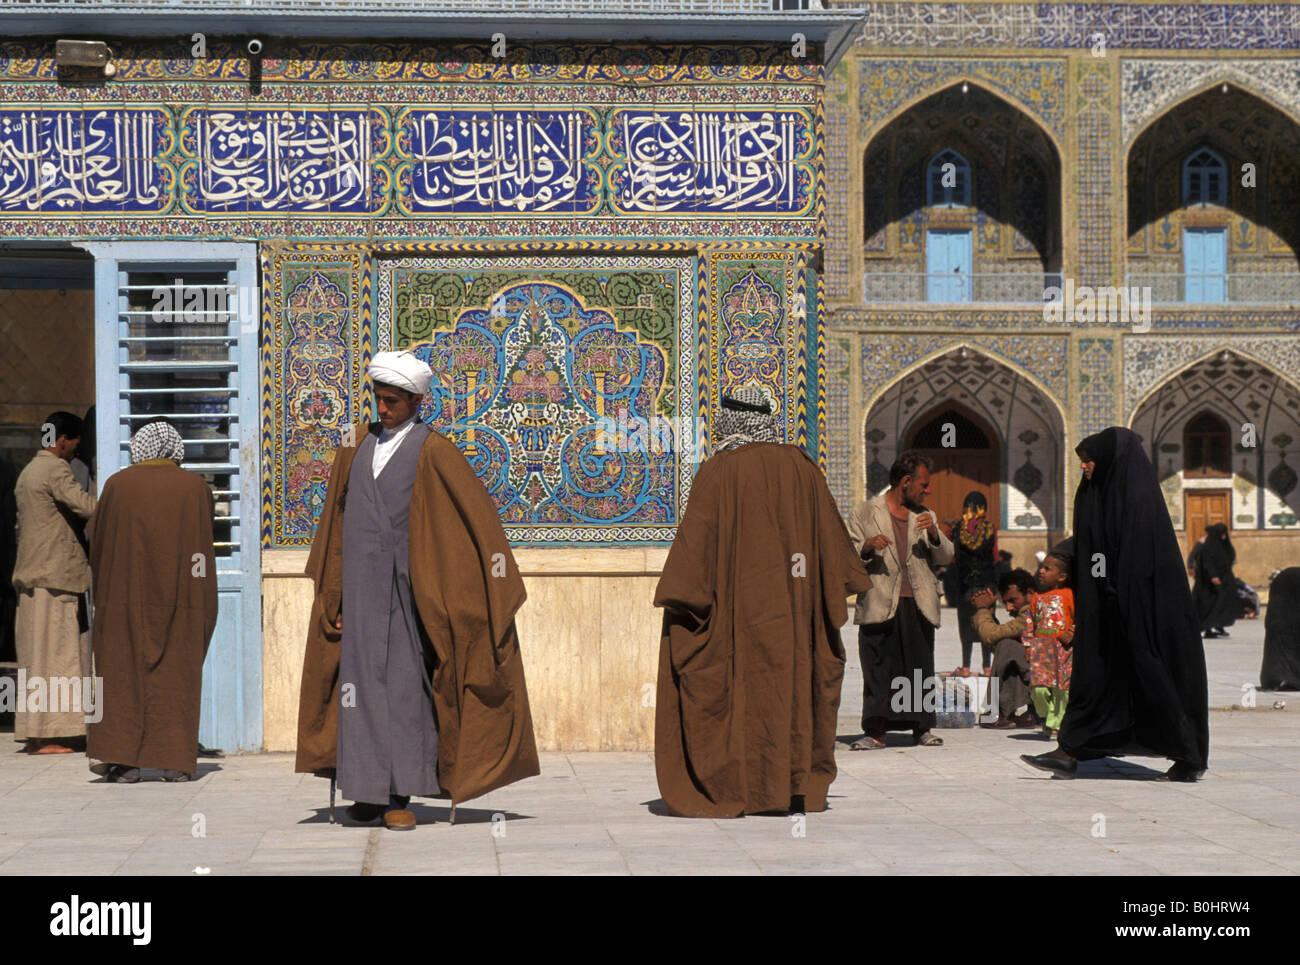 Maula Ali Shrine Wallpaper: Shia Pilgrims And Scholars At Shrine Of The Imam Ali